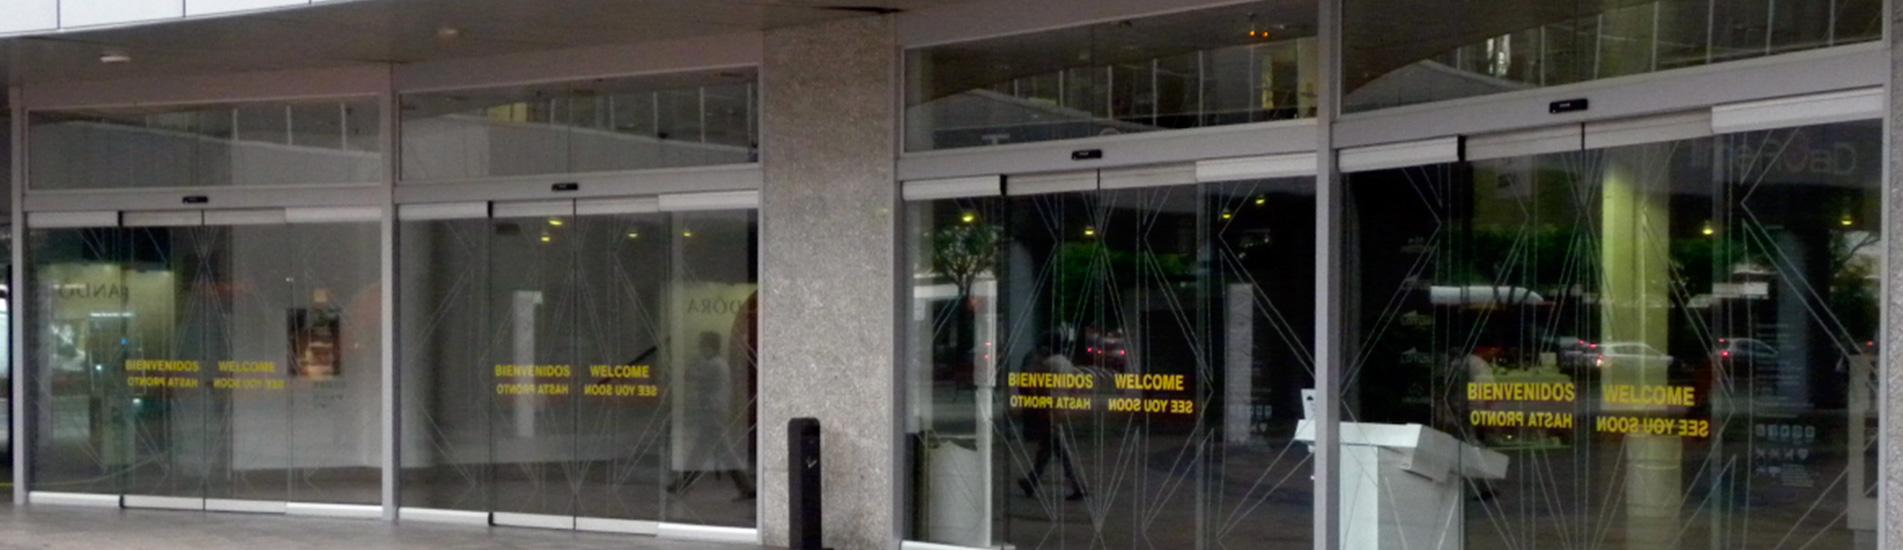 Centro-Comercial-Nervion-Plaza